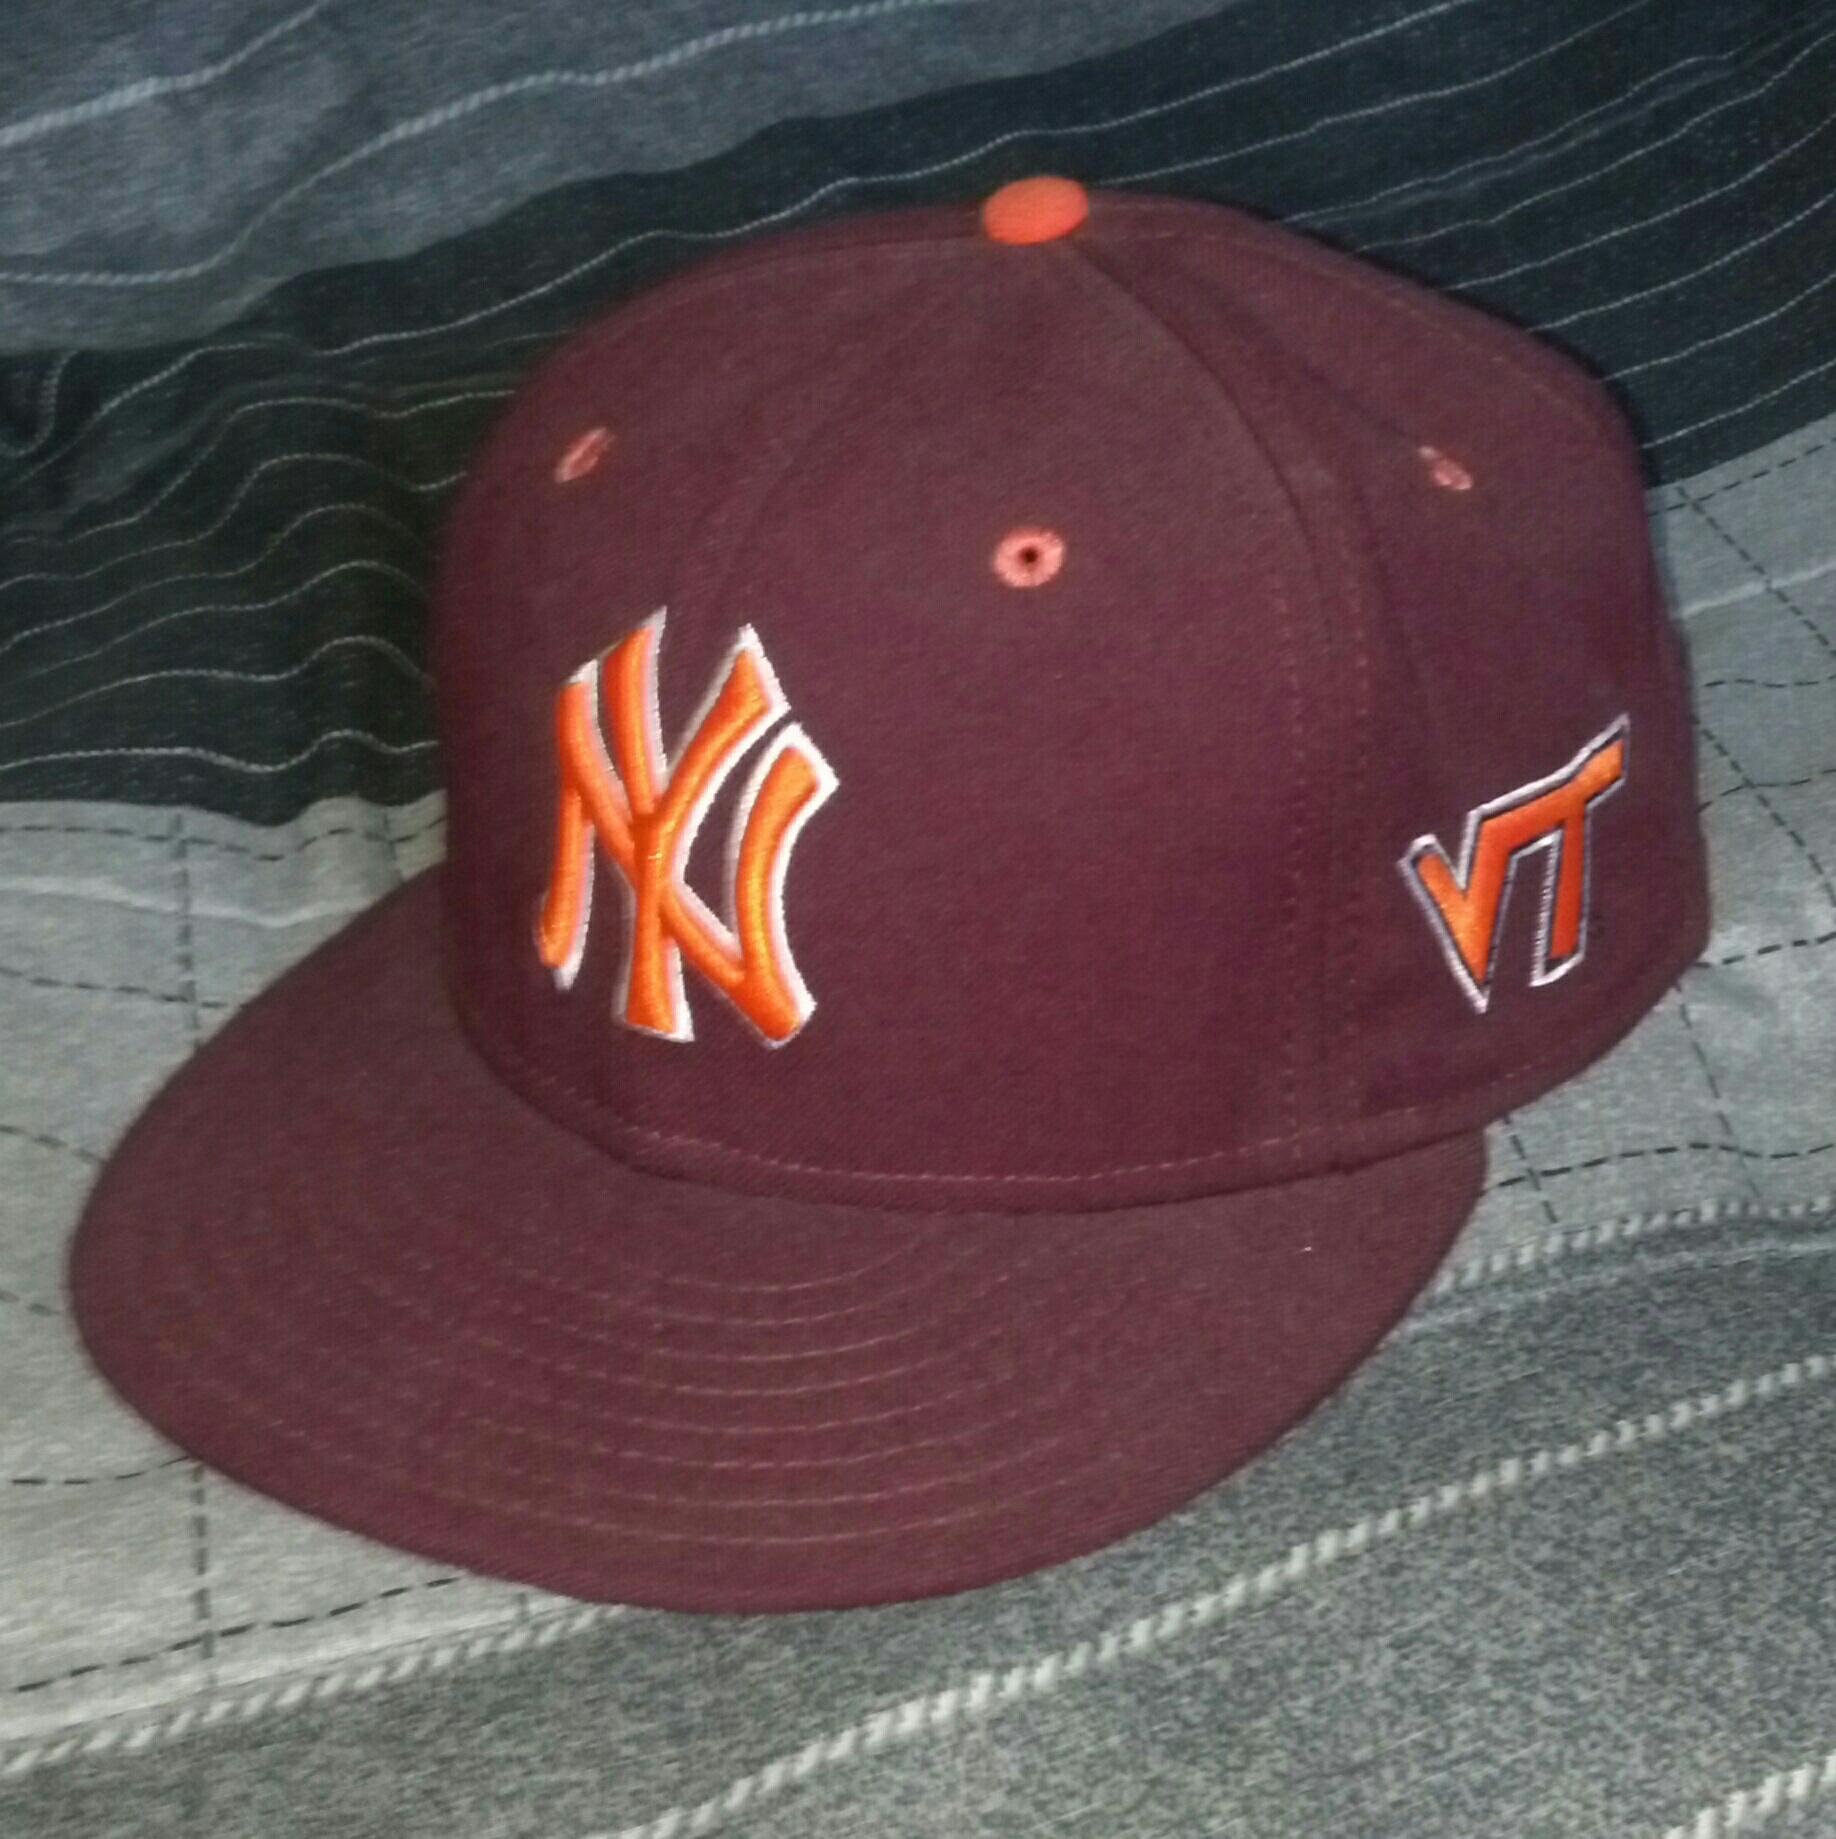 RT @24NYY: @lids4hats Yankees 'Virginia Tech' http://t.co/sVCPv1lo60